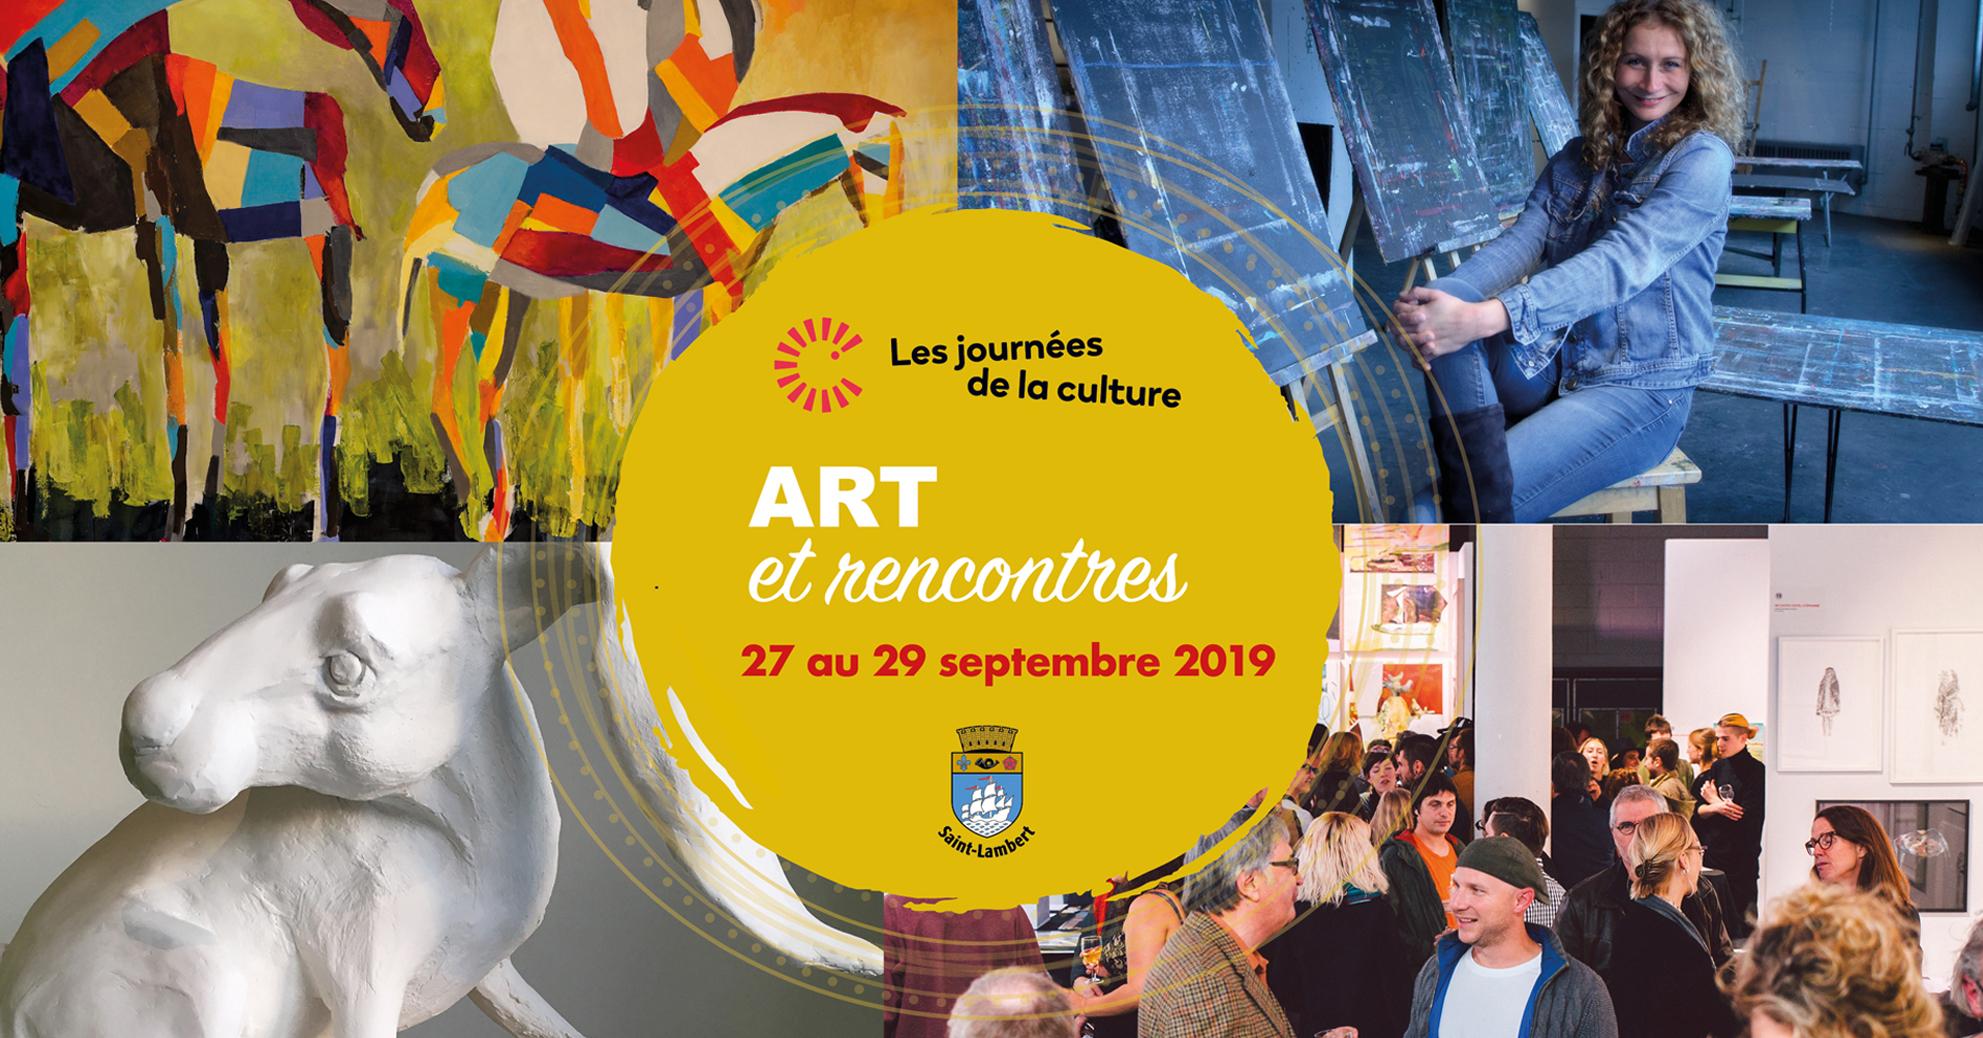 Spotlight on encounters during the Journées de la culture in Saint-Lambert!